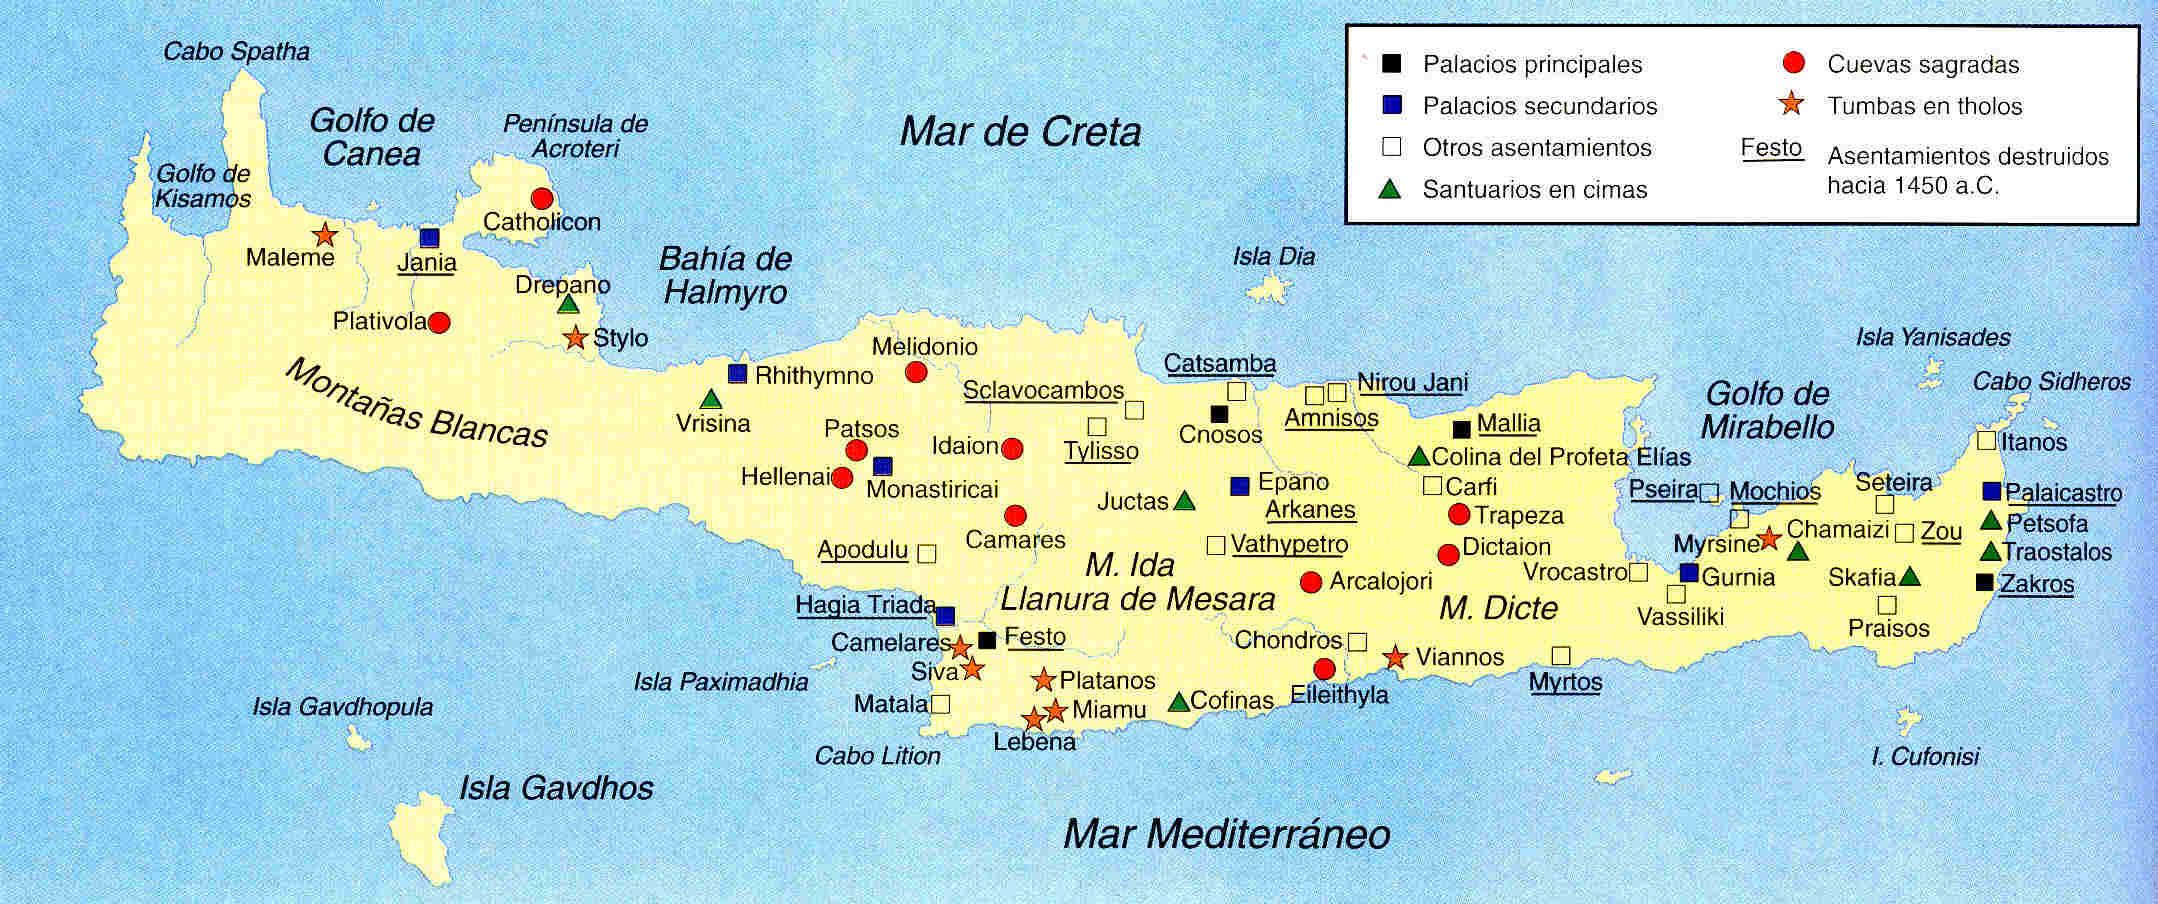 Mapa De La Creta Minoica Griechische Mythologie Mythologie Griechisch